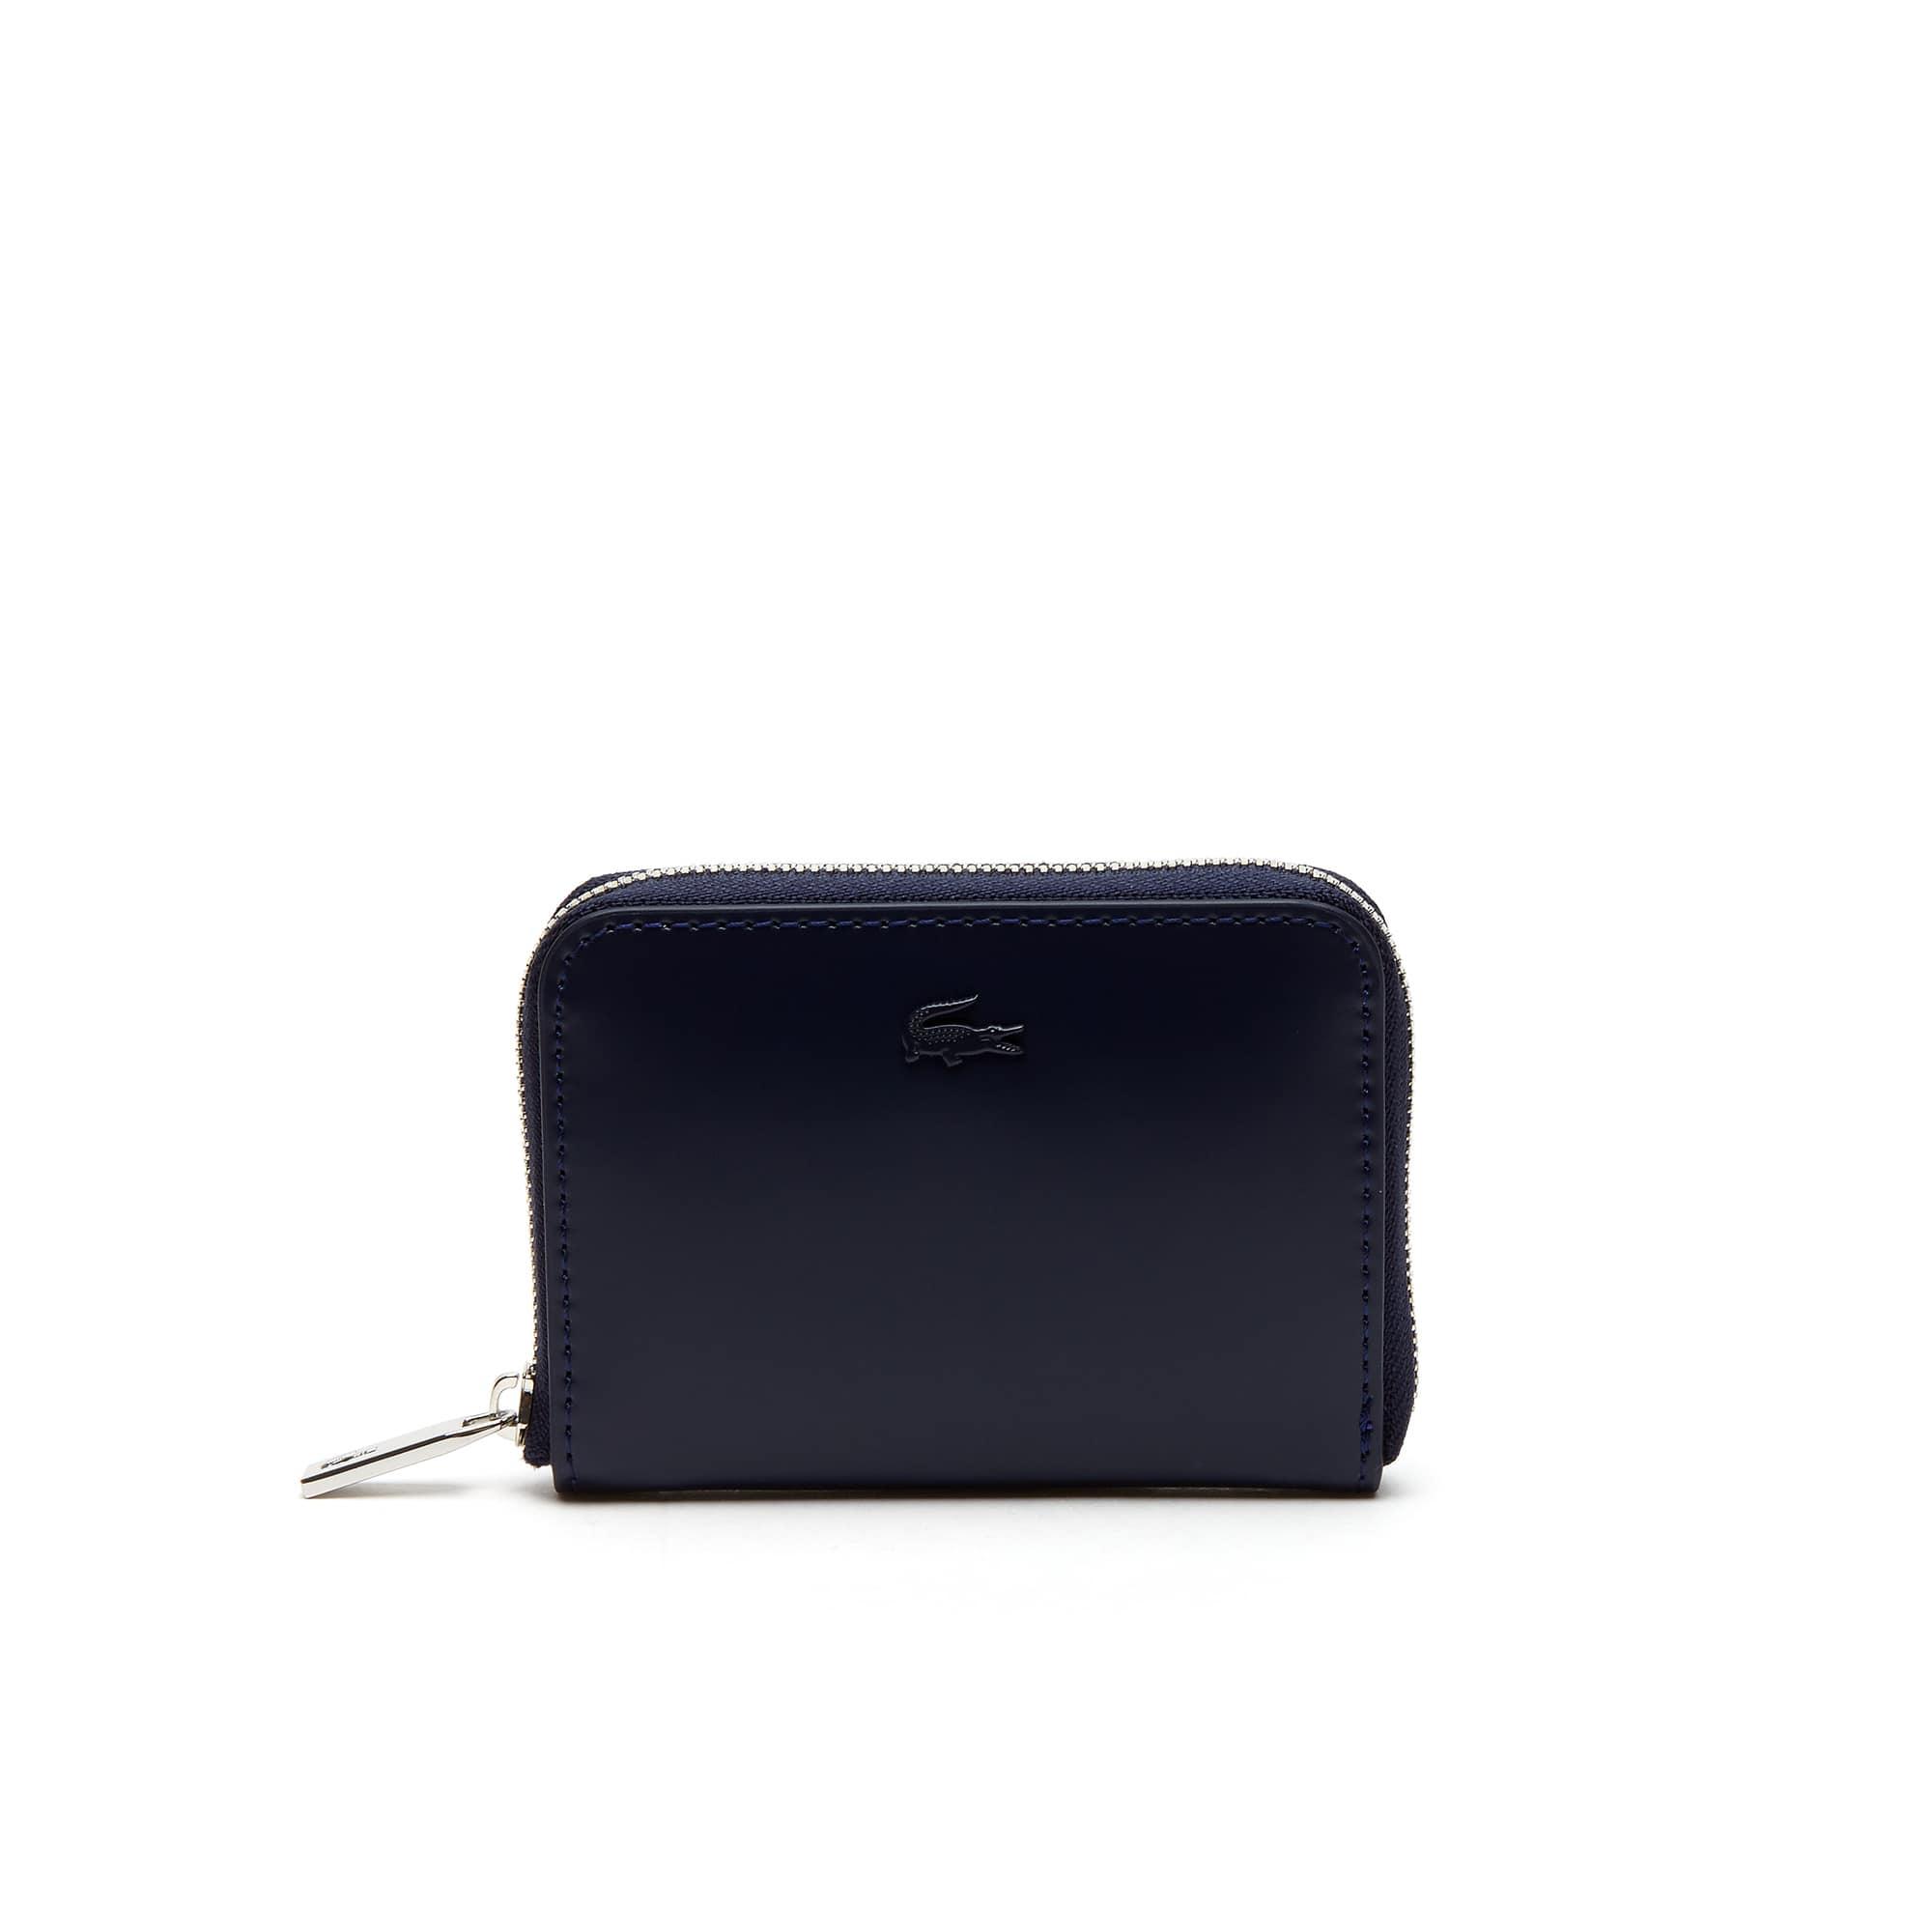 Women's Mini Golf Glazed Leather Zip Coin Pouch